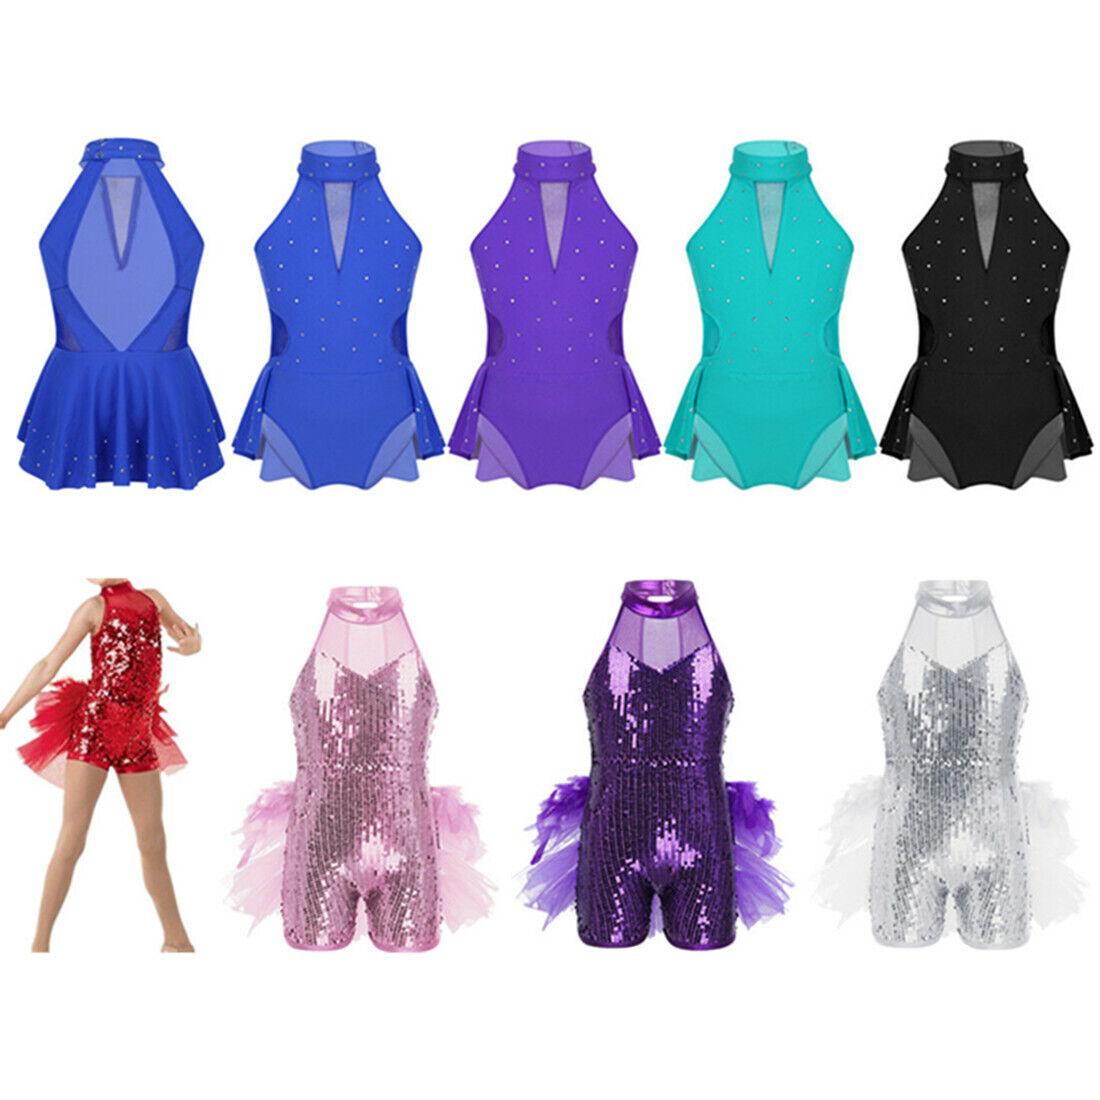 Girls Sequins Jazz Latin Dance Dress Gymnastics High Neck Leotard Ballet Costume